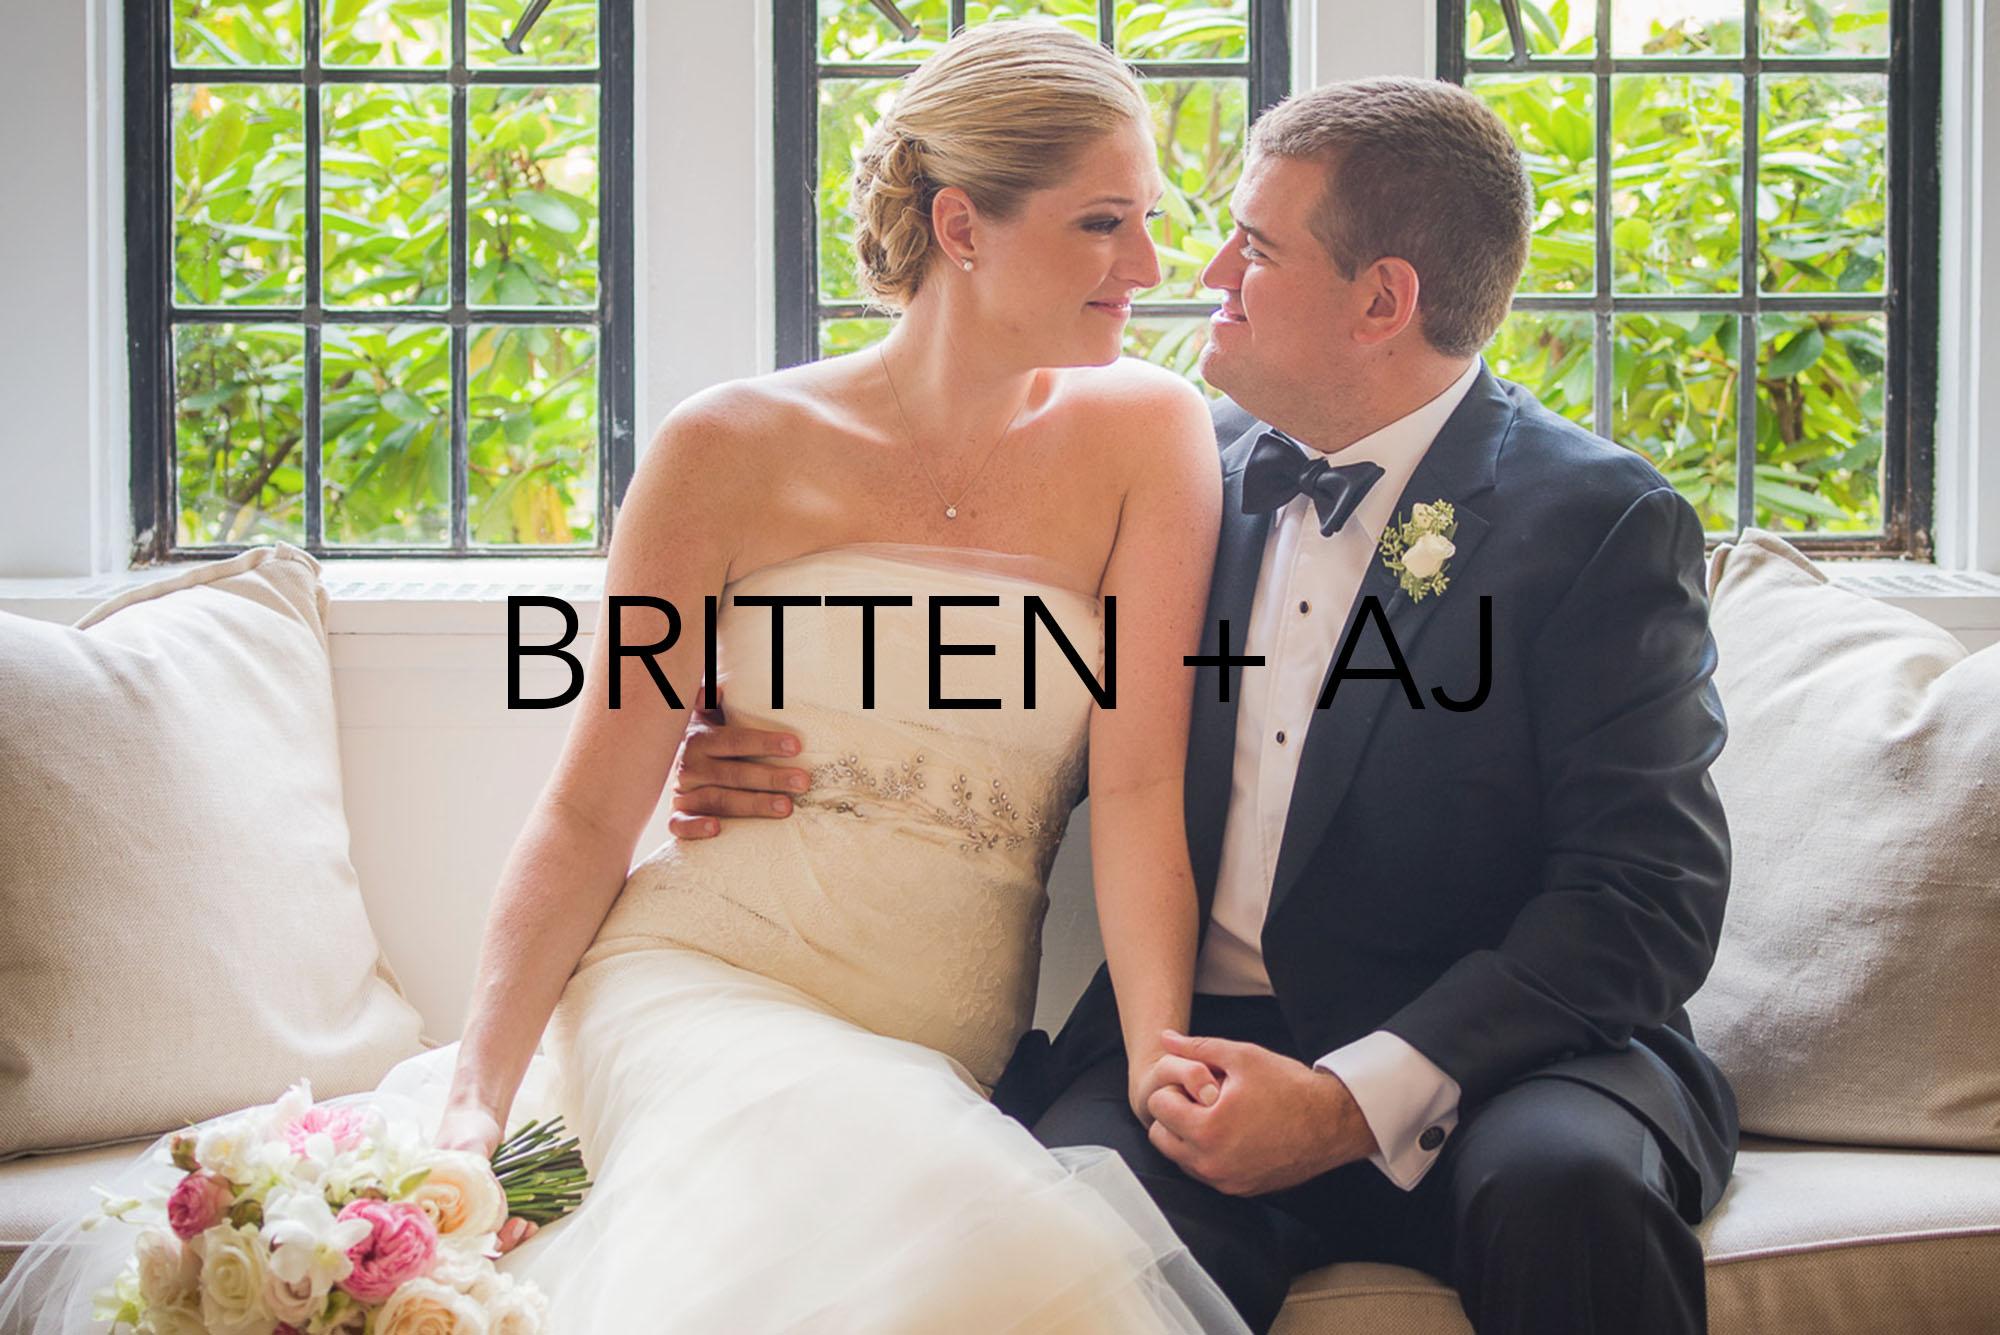 The Wedding of Britten and AJ at the Tuxedo Club, Tuxedo, NY. (Craig Warga Weddings)